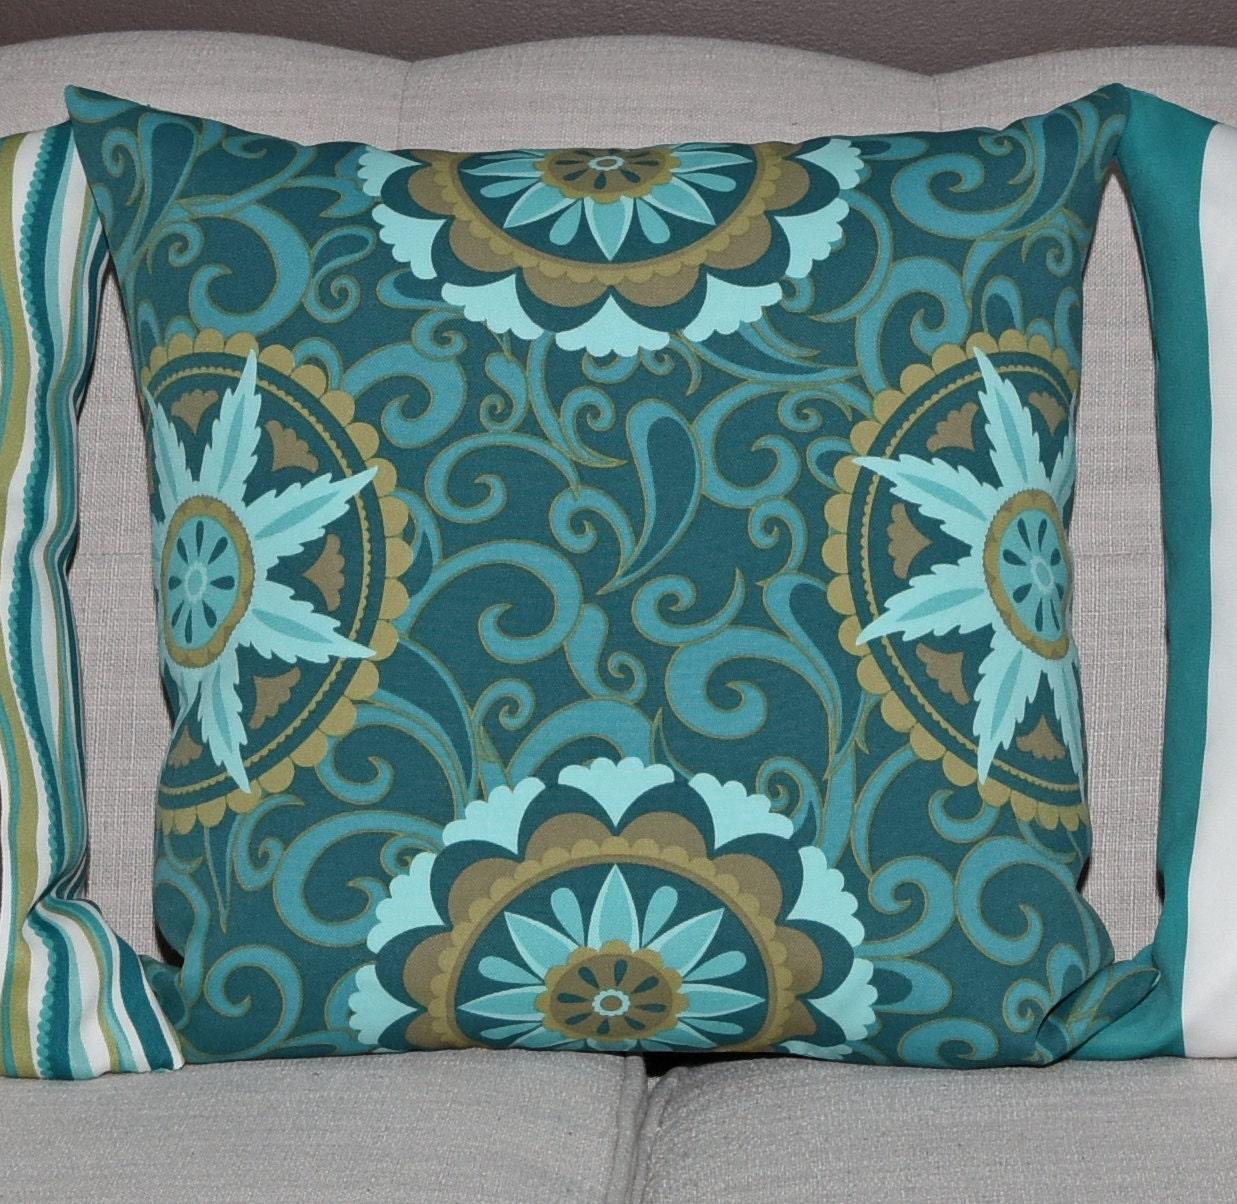 Seafoam Blue Decorative Pillows : Outdoor Decorative Pillow Cover Seafoam Green Blue Olive